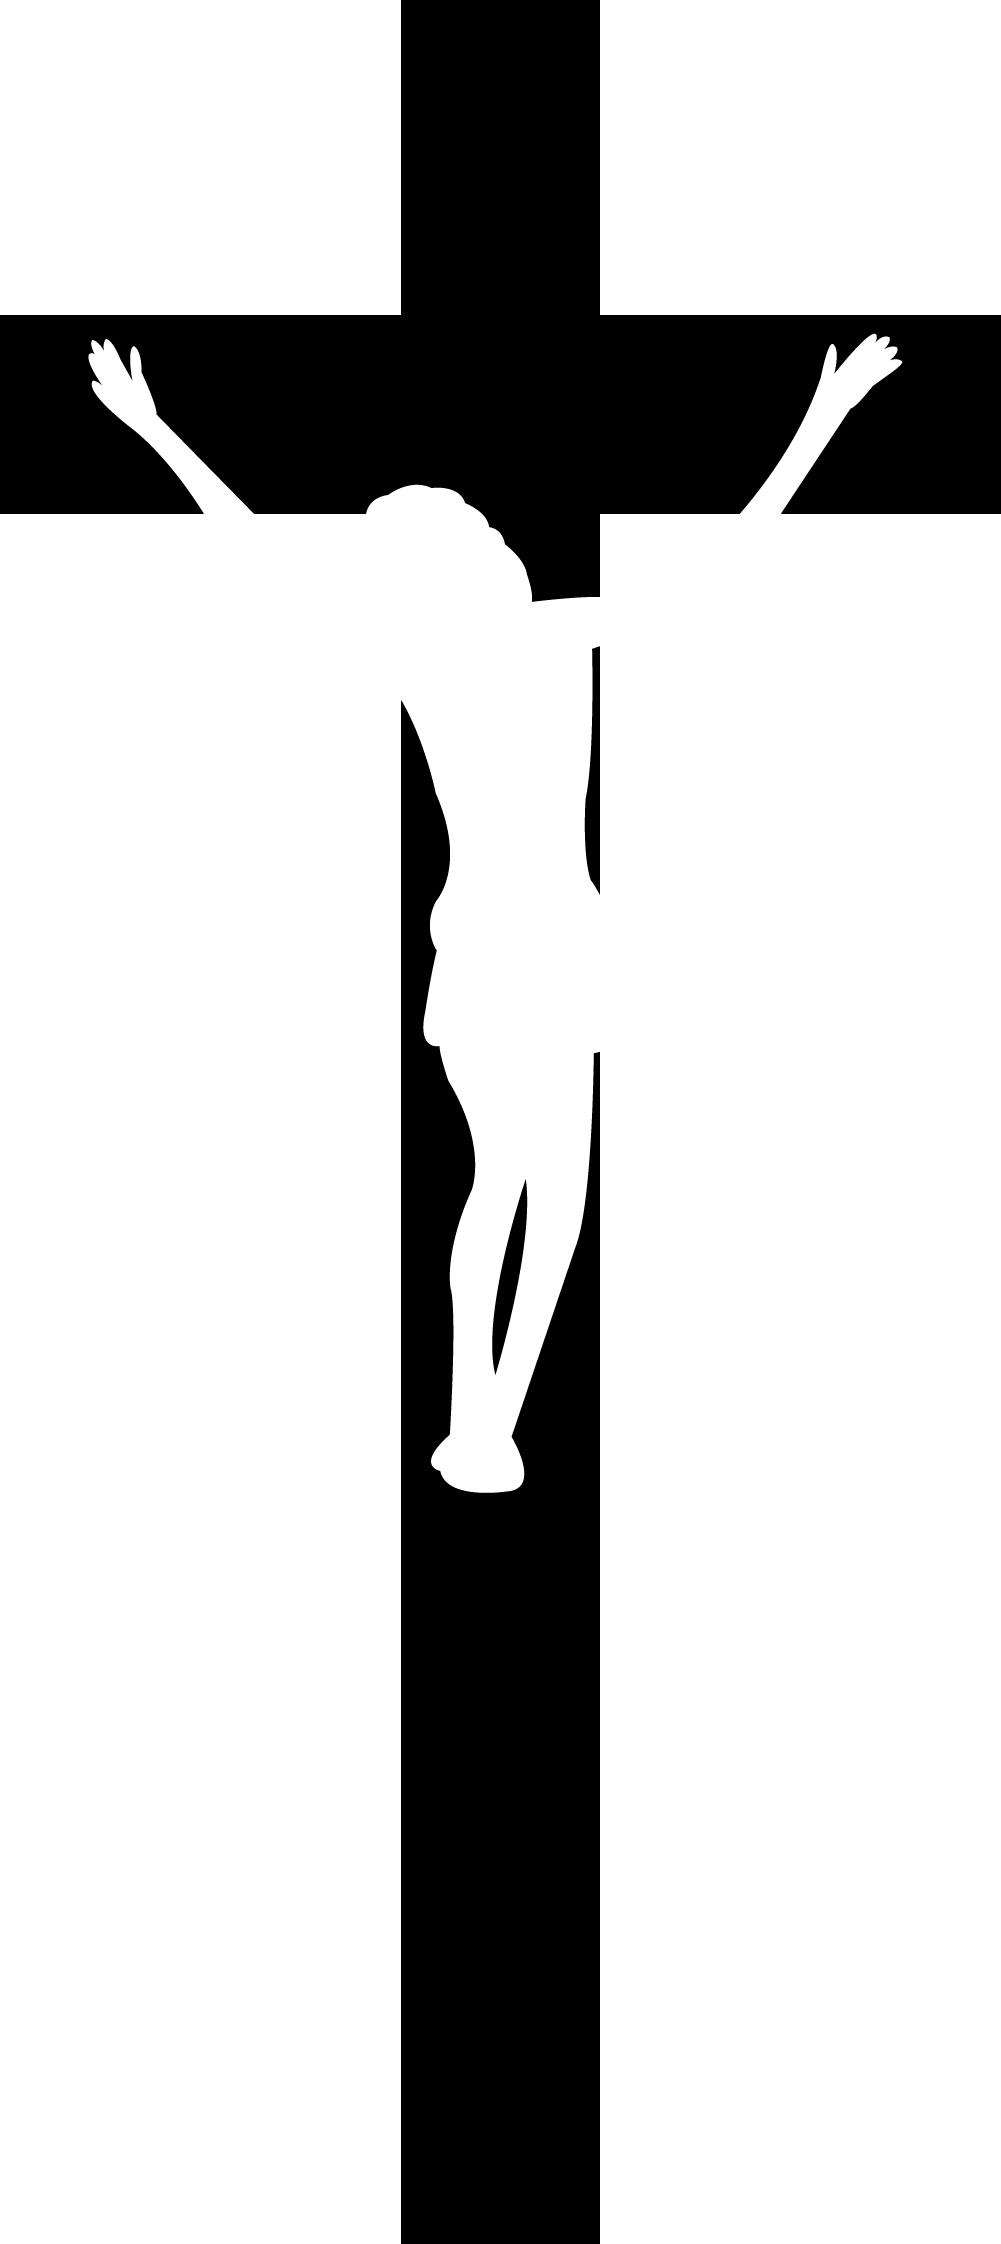 1001x2244 Greece Christian Cross Crucifixion Of Jesus